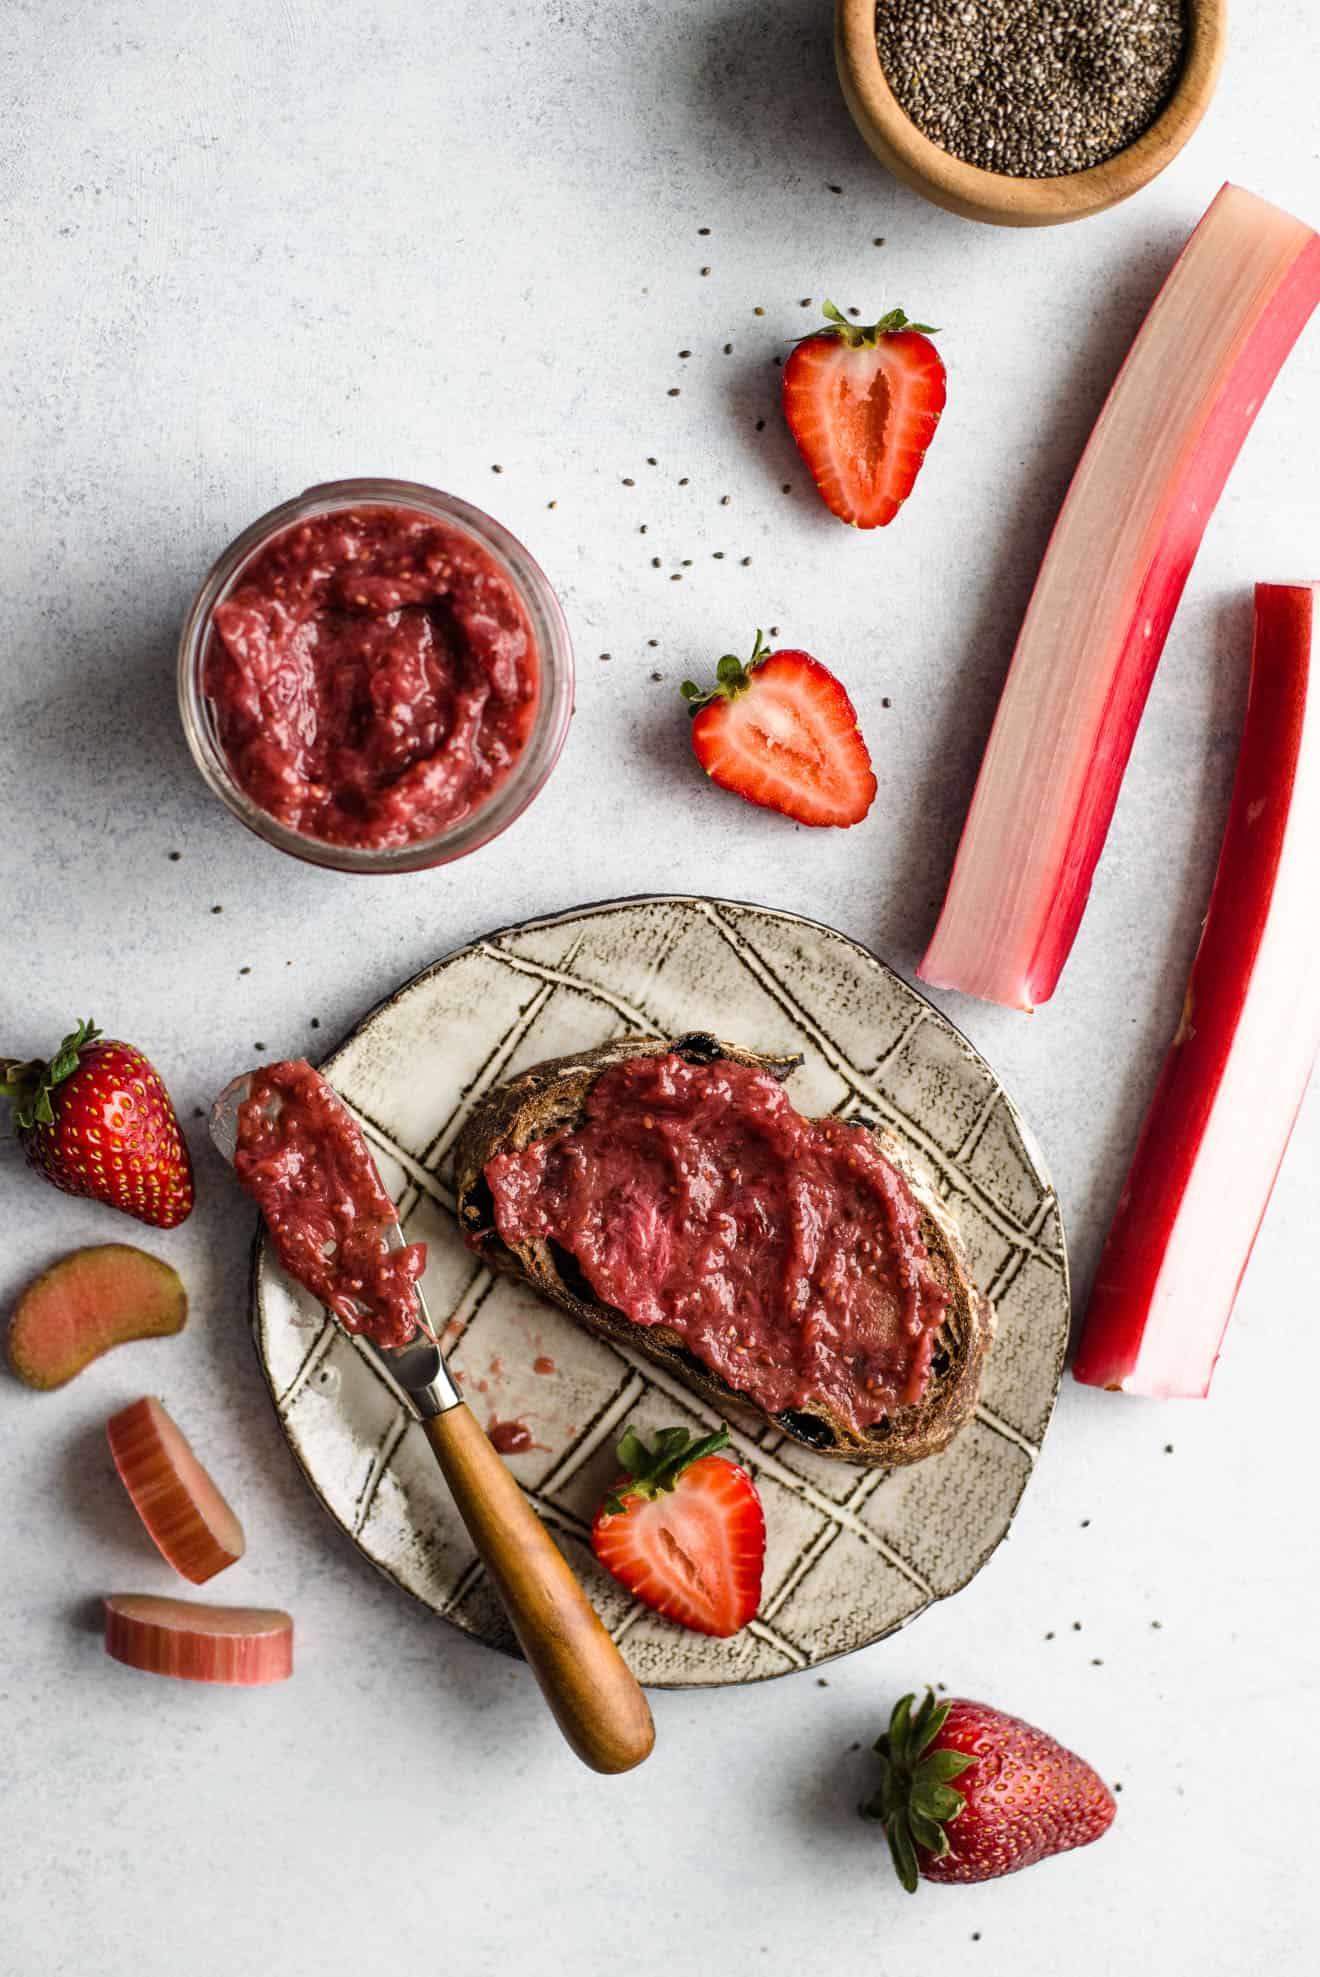 Strawberry Rhubarb Chia Seed Jam - an easy, paleo-friendly jam!